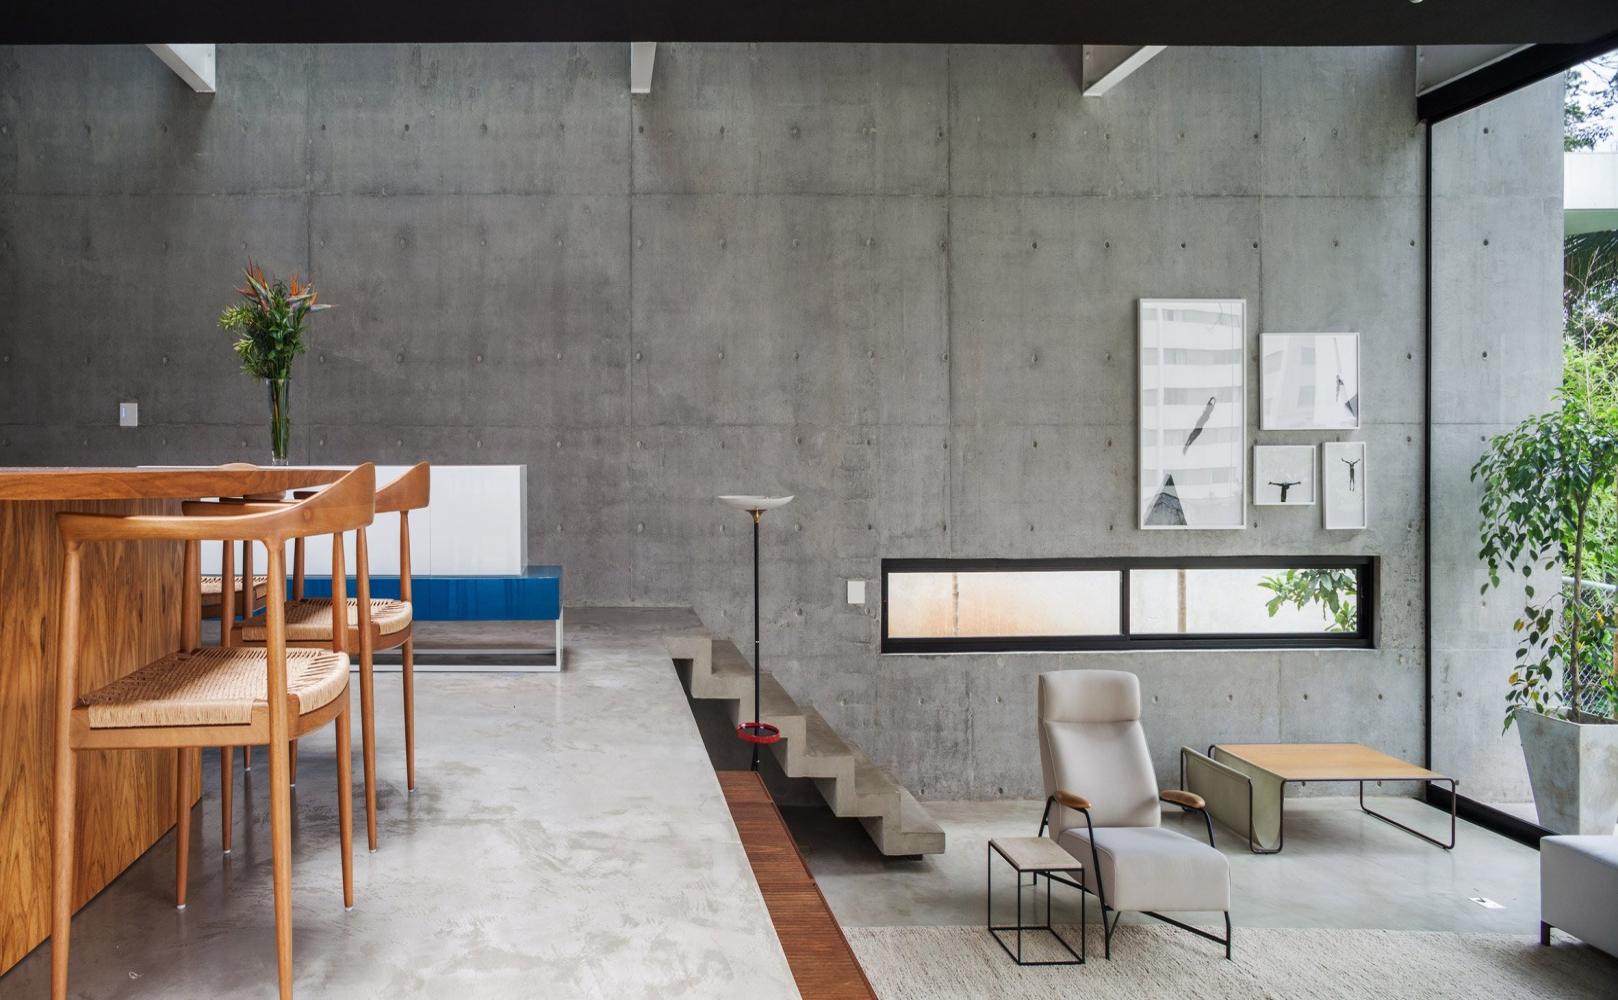 Xmattos-house-fgmf-arquitetos-sao-paulo-brazil-modernist-concrete-hillside_dezeen_4